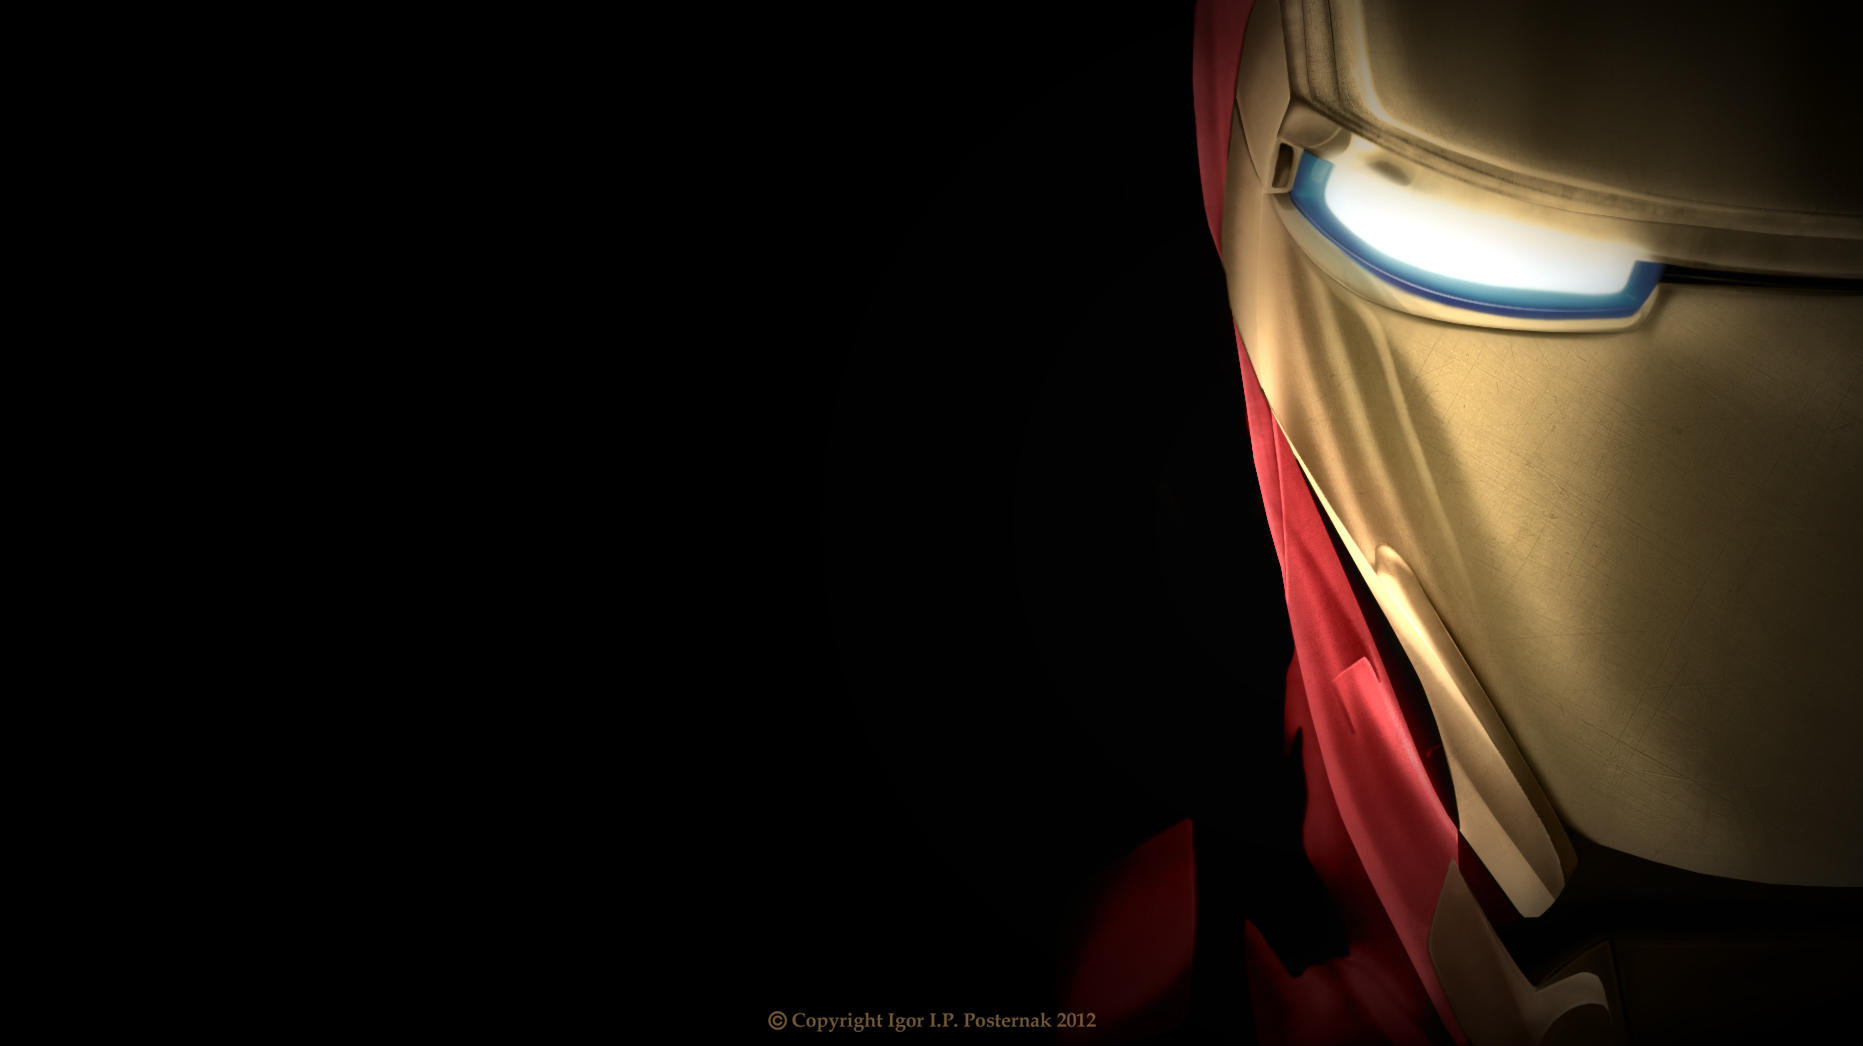 Iron Man HD Wallpapers Pack By IgorPosternak